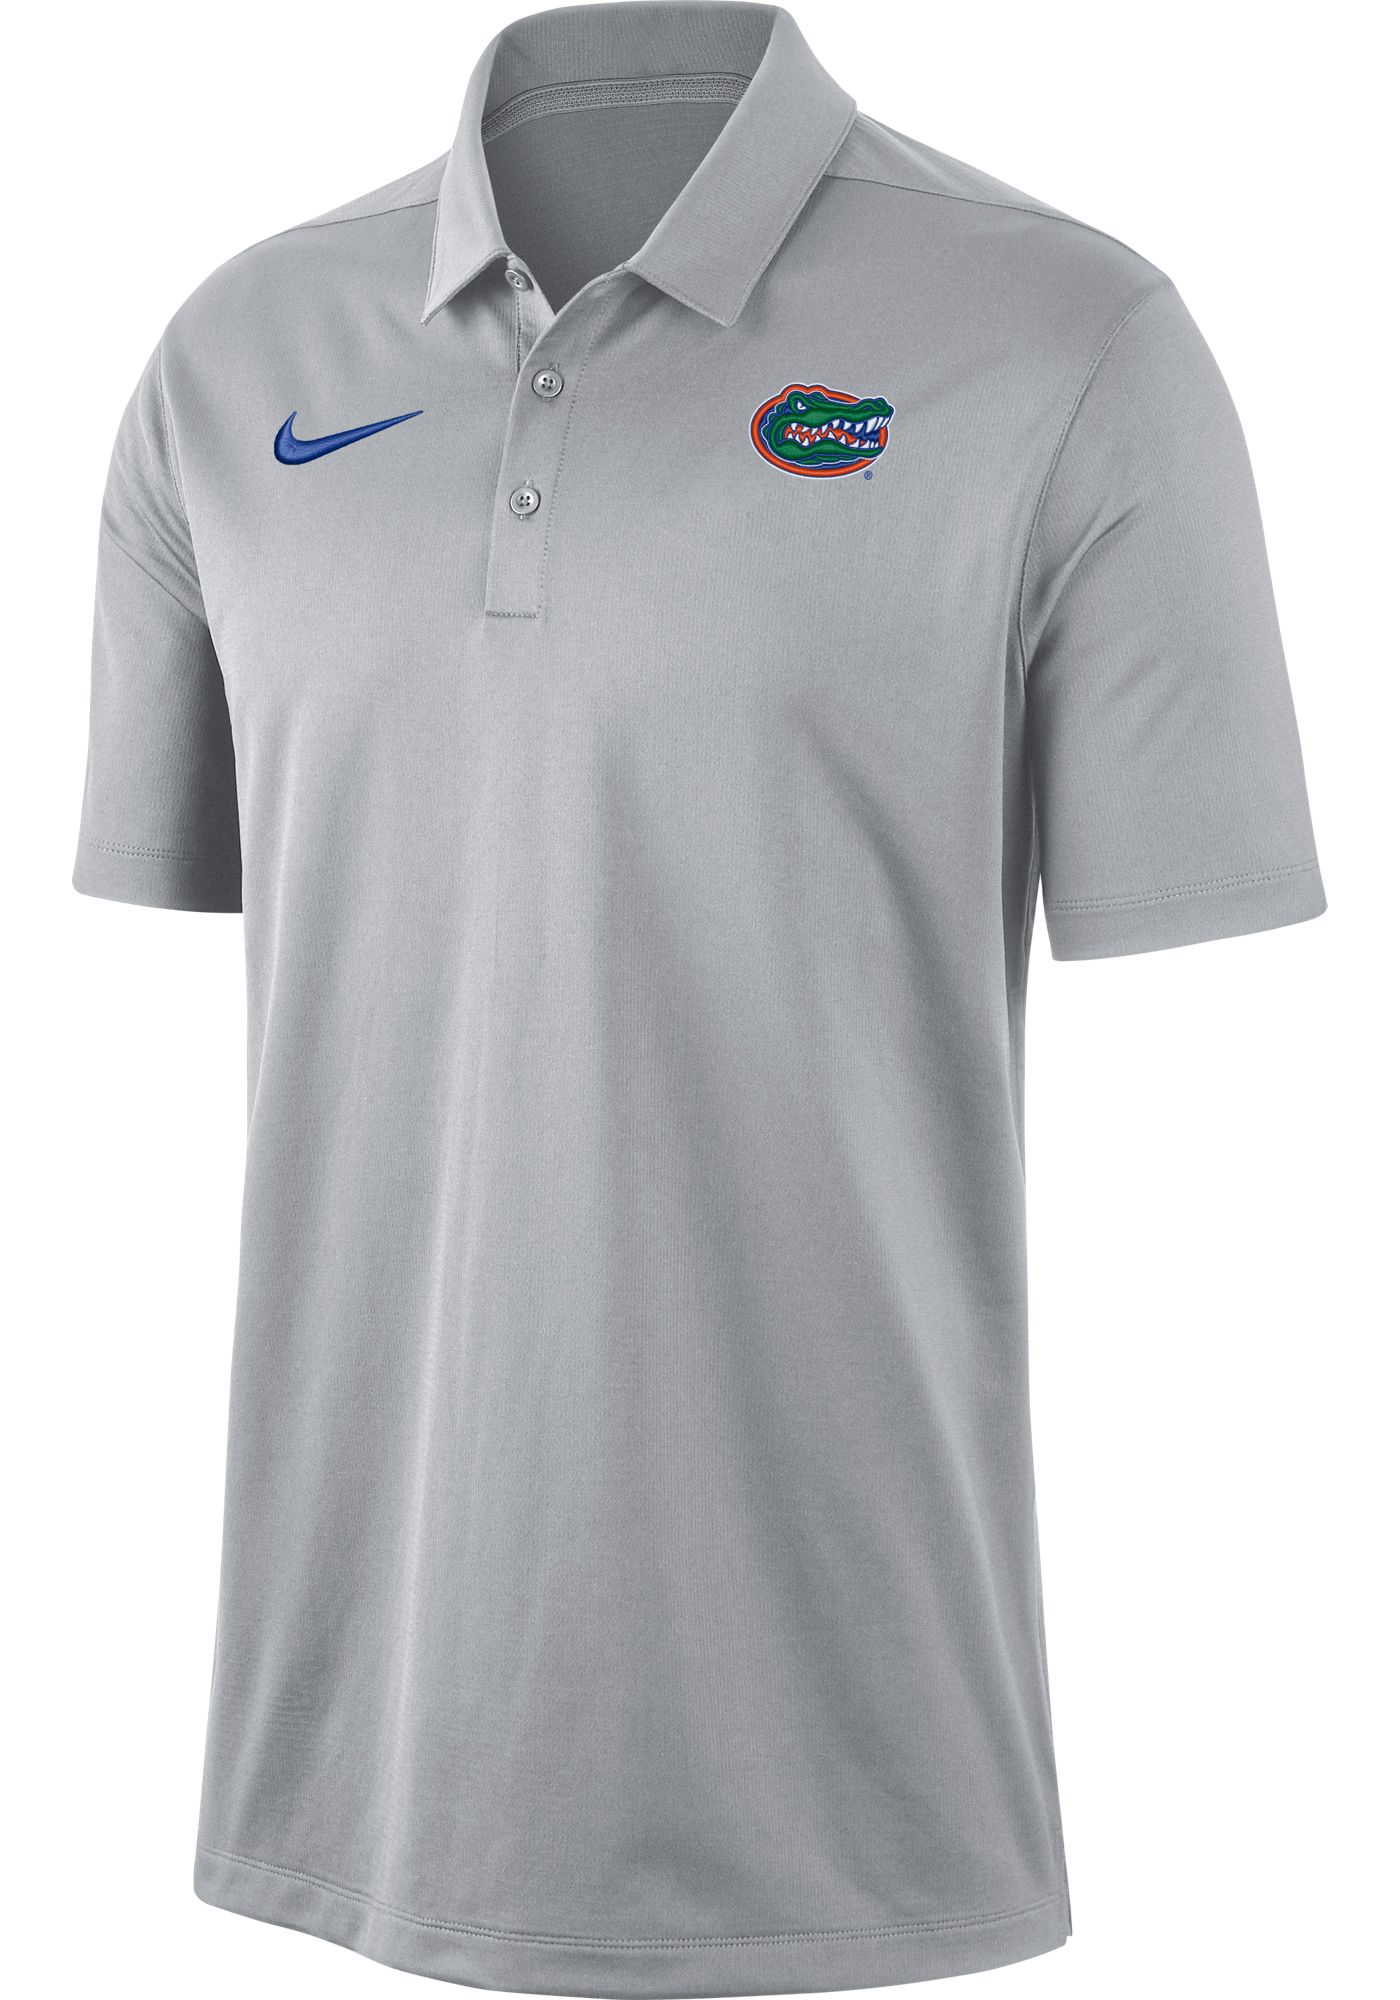 Nike Men's Florida Gators Grey Dri-FIT Franchise Polo